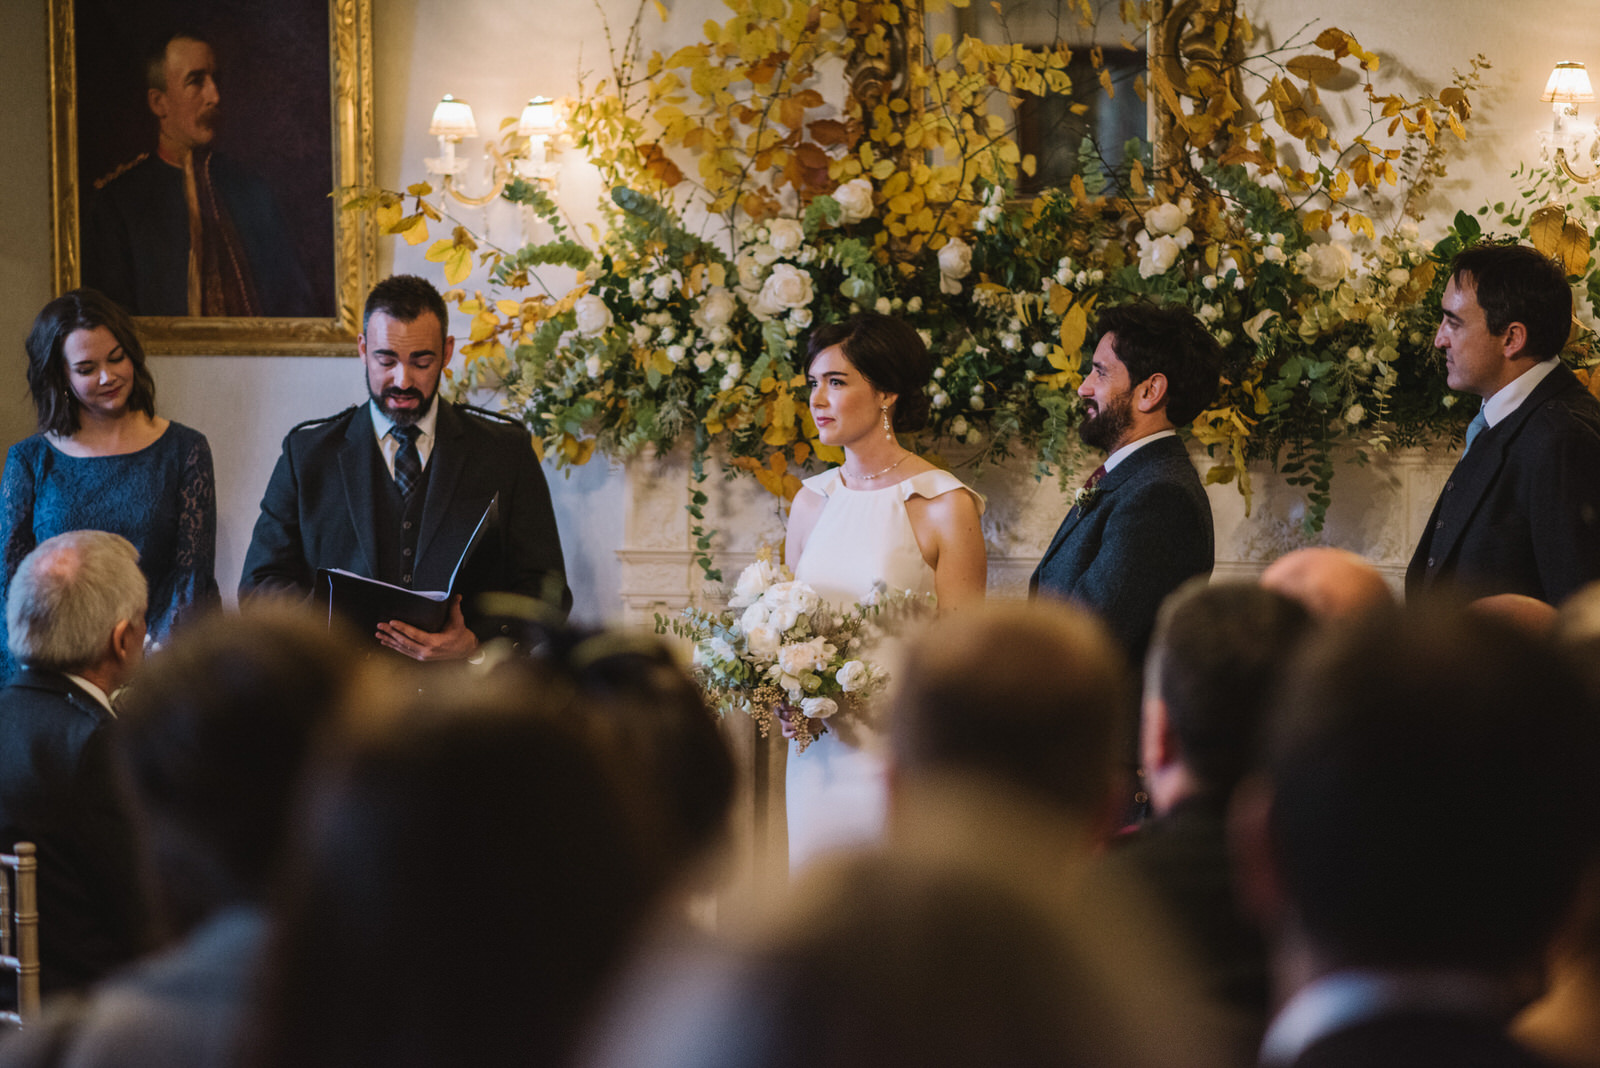 032-COLSTOUN-HOUSE-WEDDING-ALTERNATIVE-WEDDING-PHOTOGRAPHER-GLASGOW-WEDDING-PHOTOGRAPHER-STYLISH-SCOTTISH-WEDDING.JPG